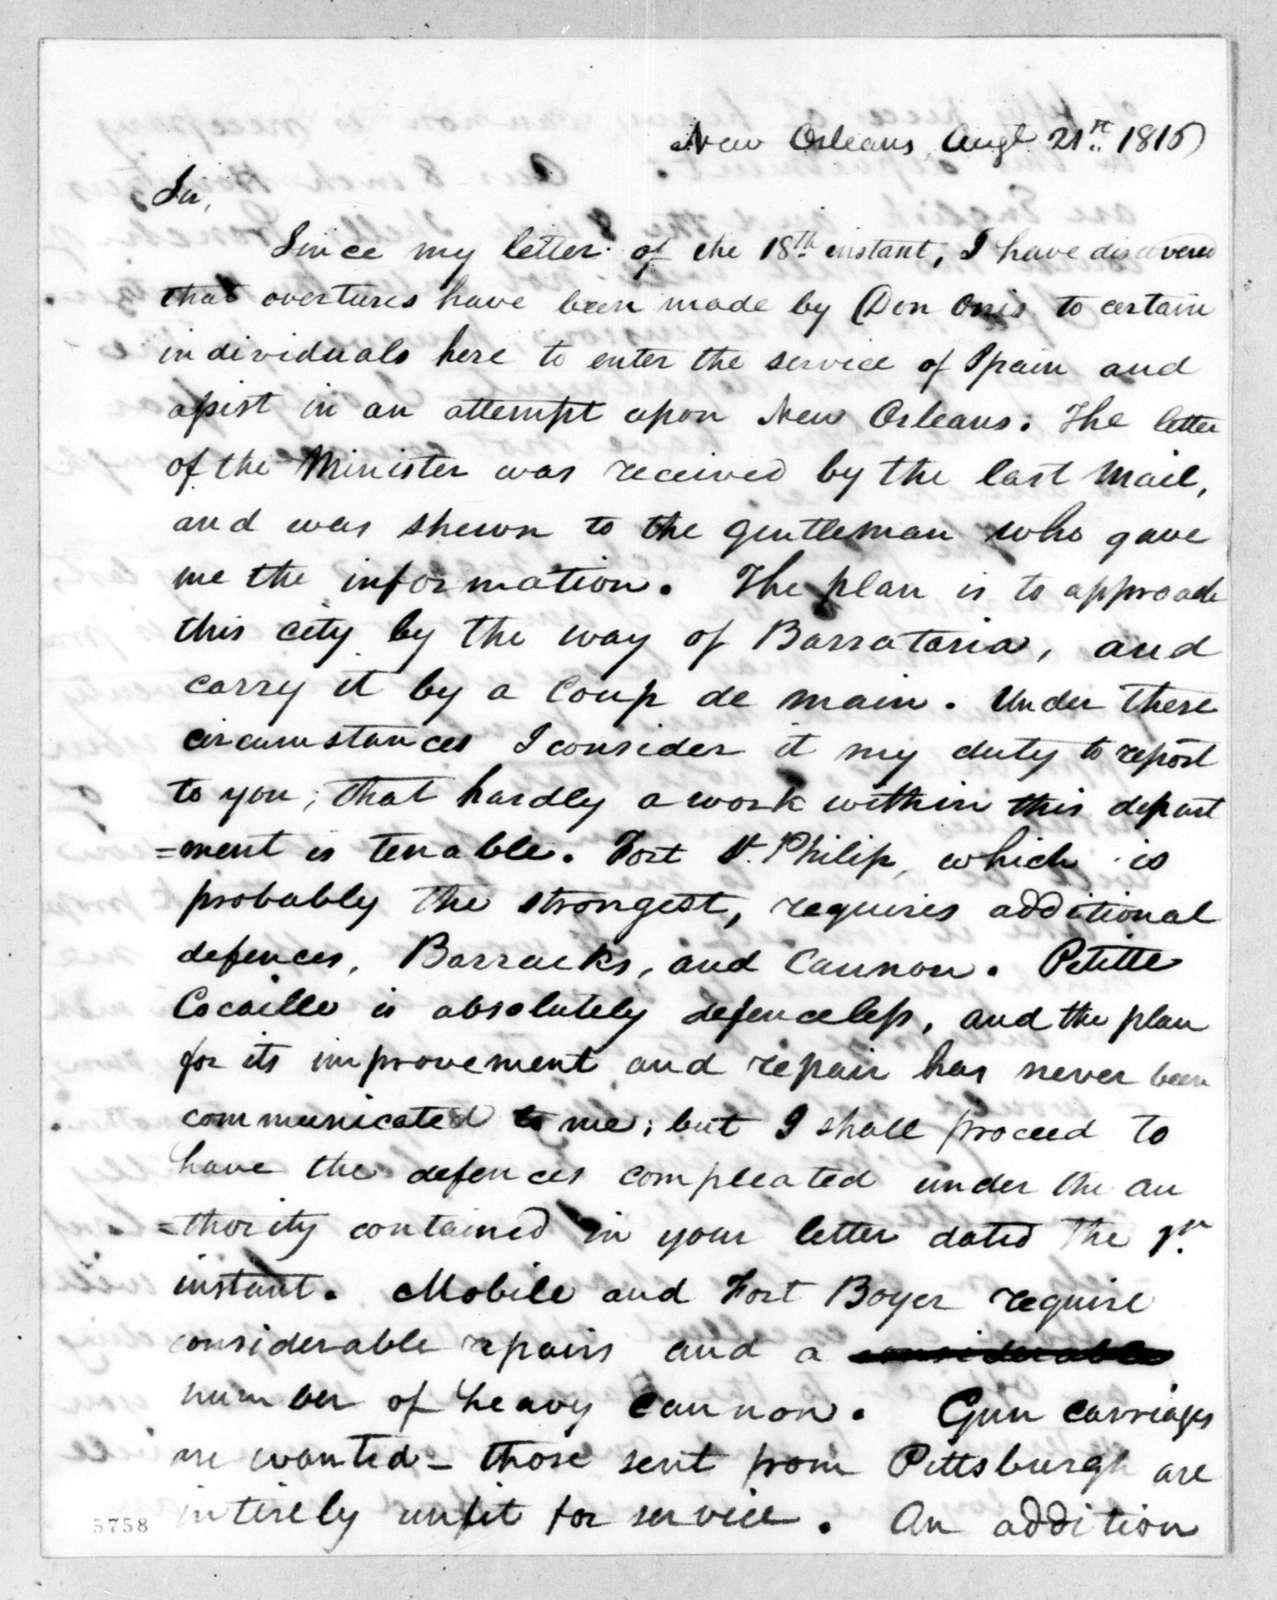 Thomas Sidney Jesup to Andrew Jackson, August 21, 1816